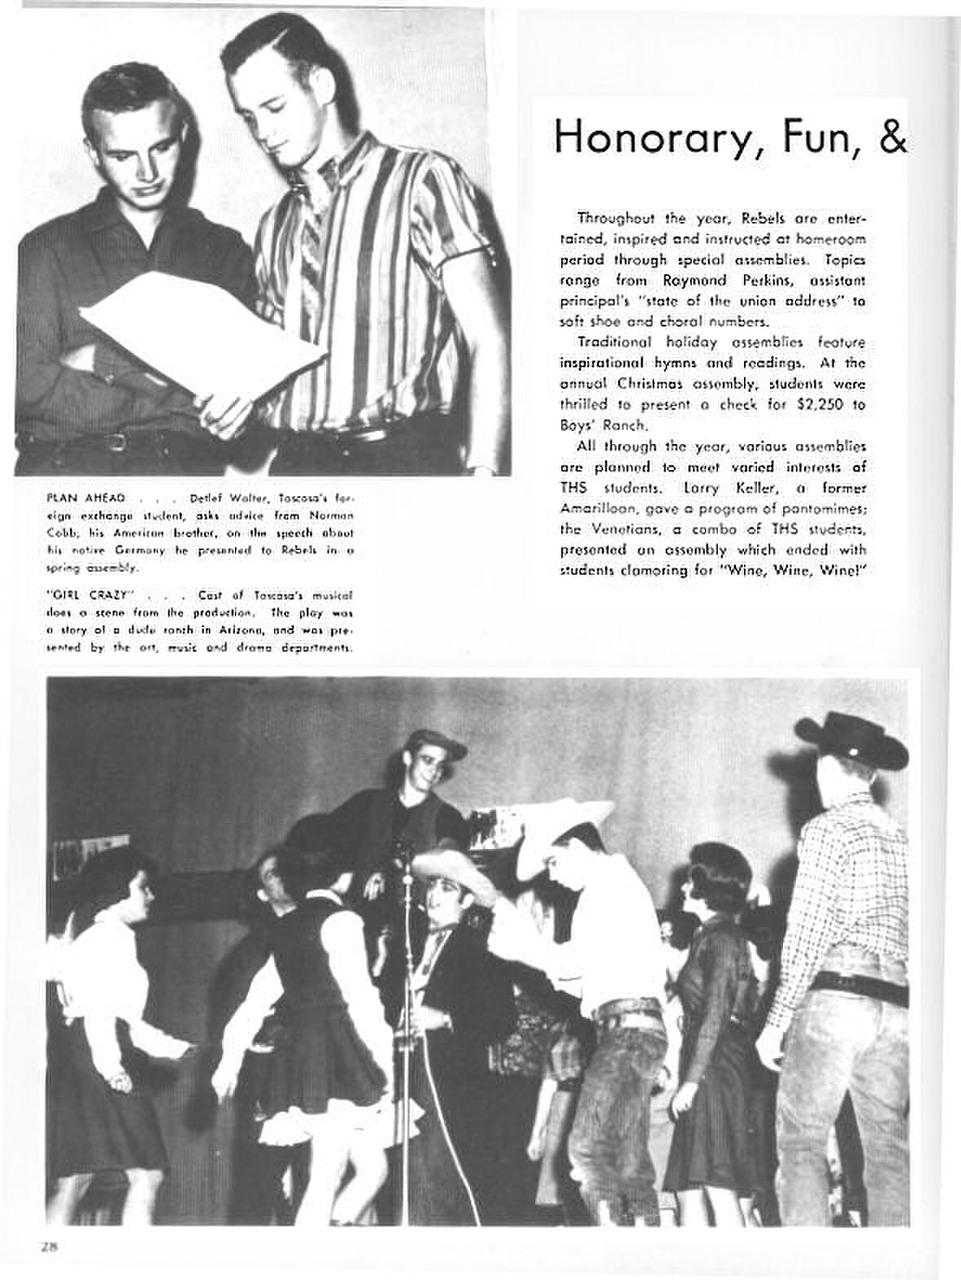 Las Memorias 1963 Seniors Yearbook